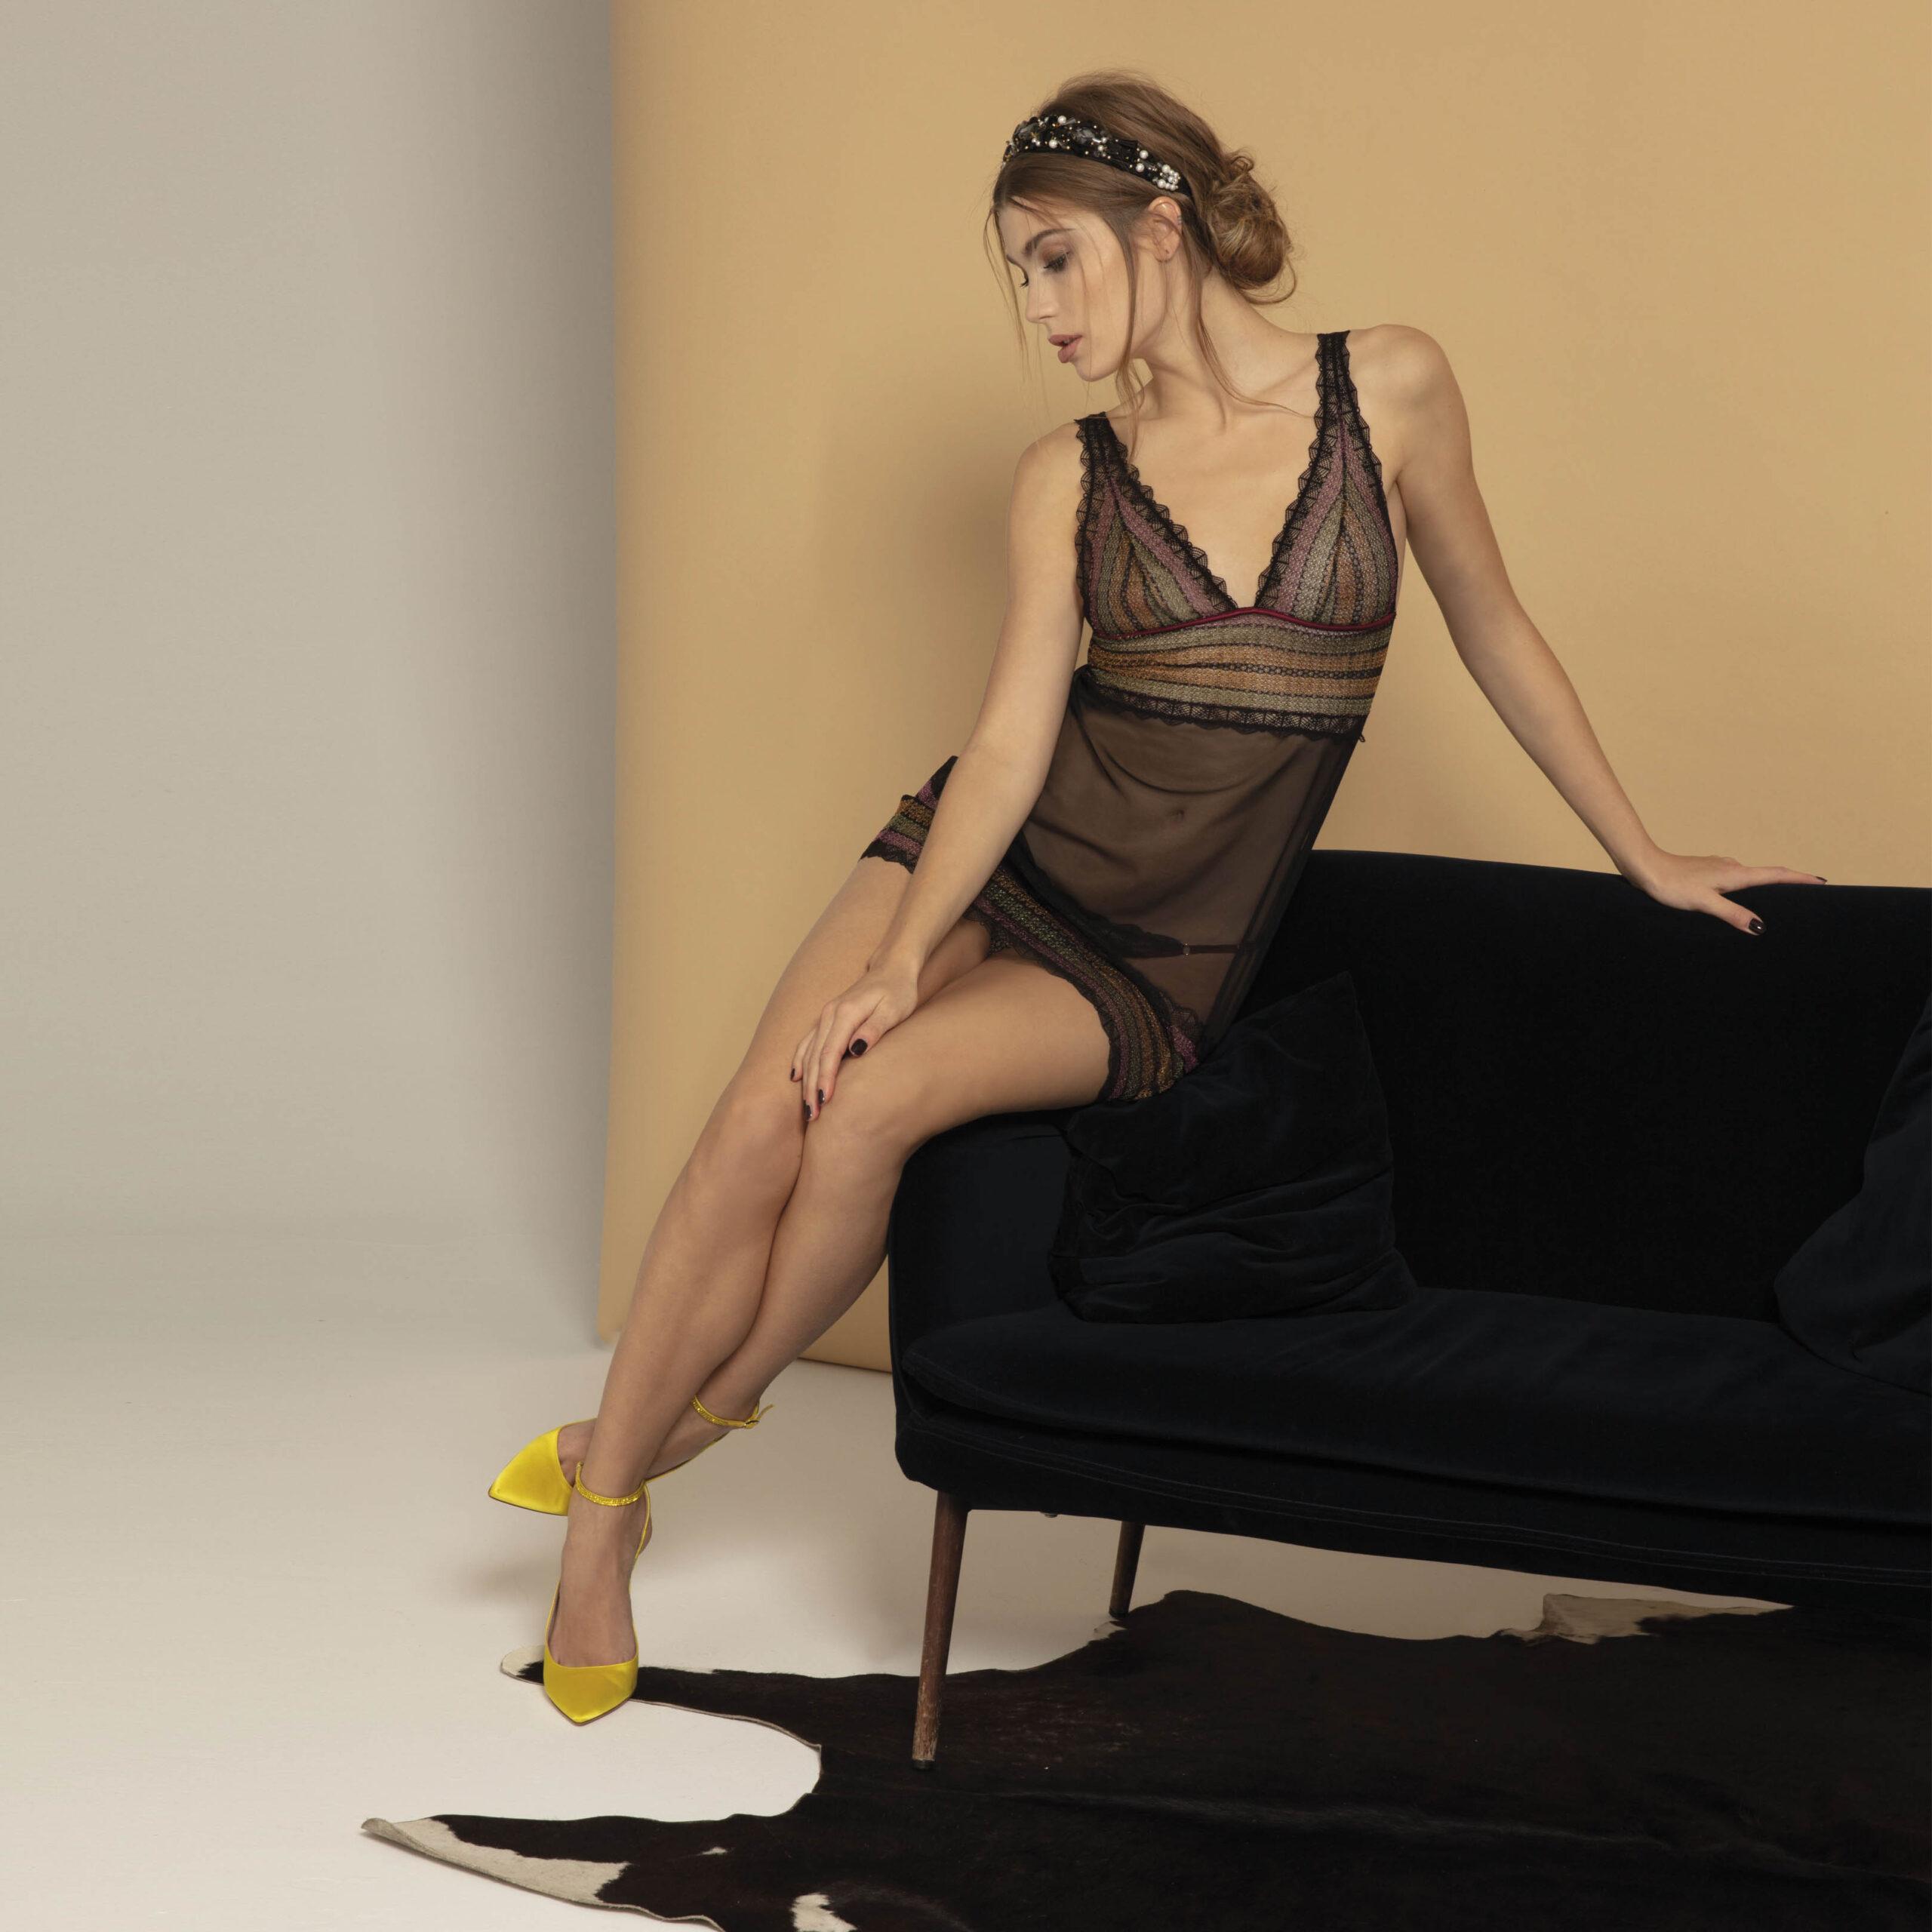 sottoveste-valery-lingerie-biancheria-intima-donna-autunno-inverno-2022